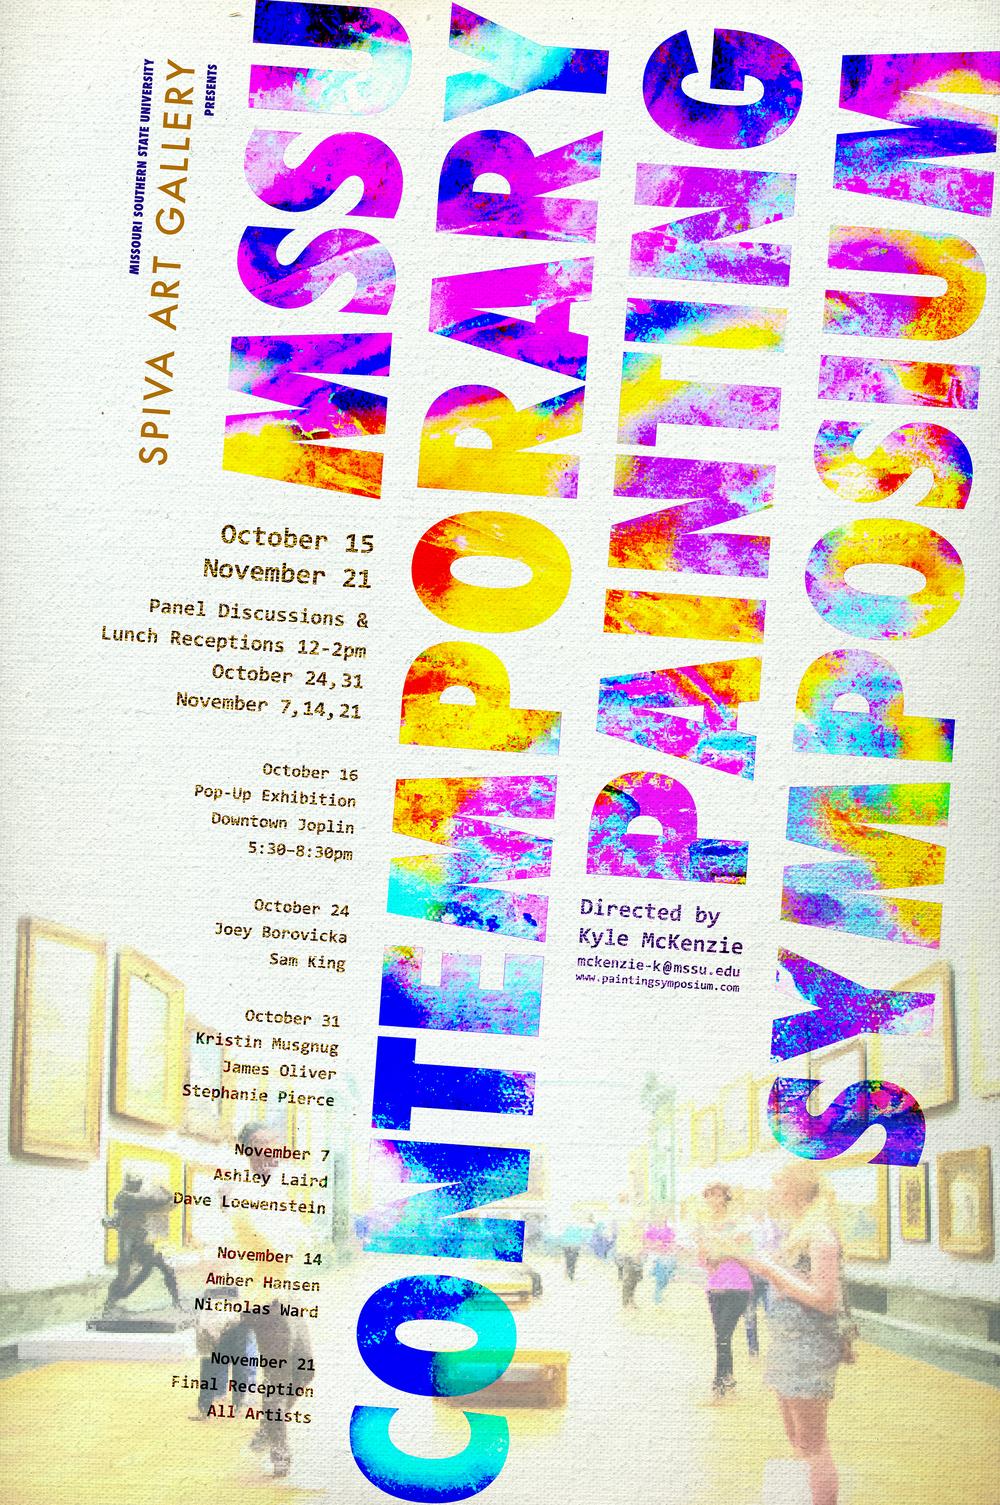 MSSU Contemporary Painting Symposium 24x36